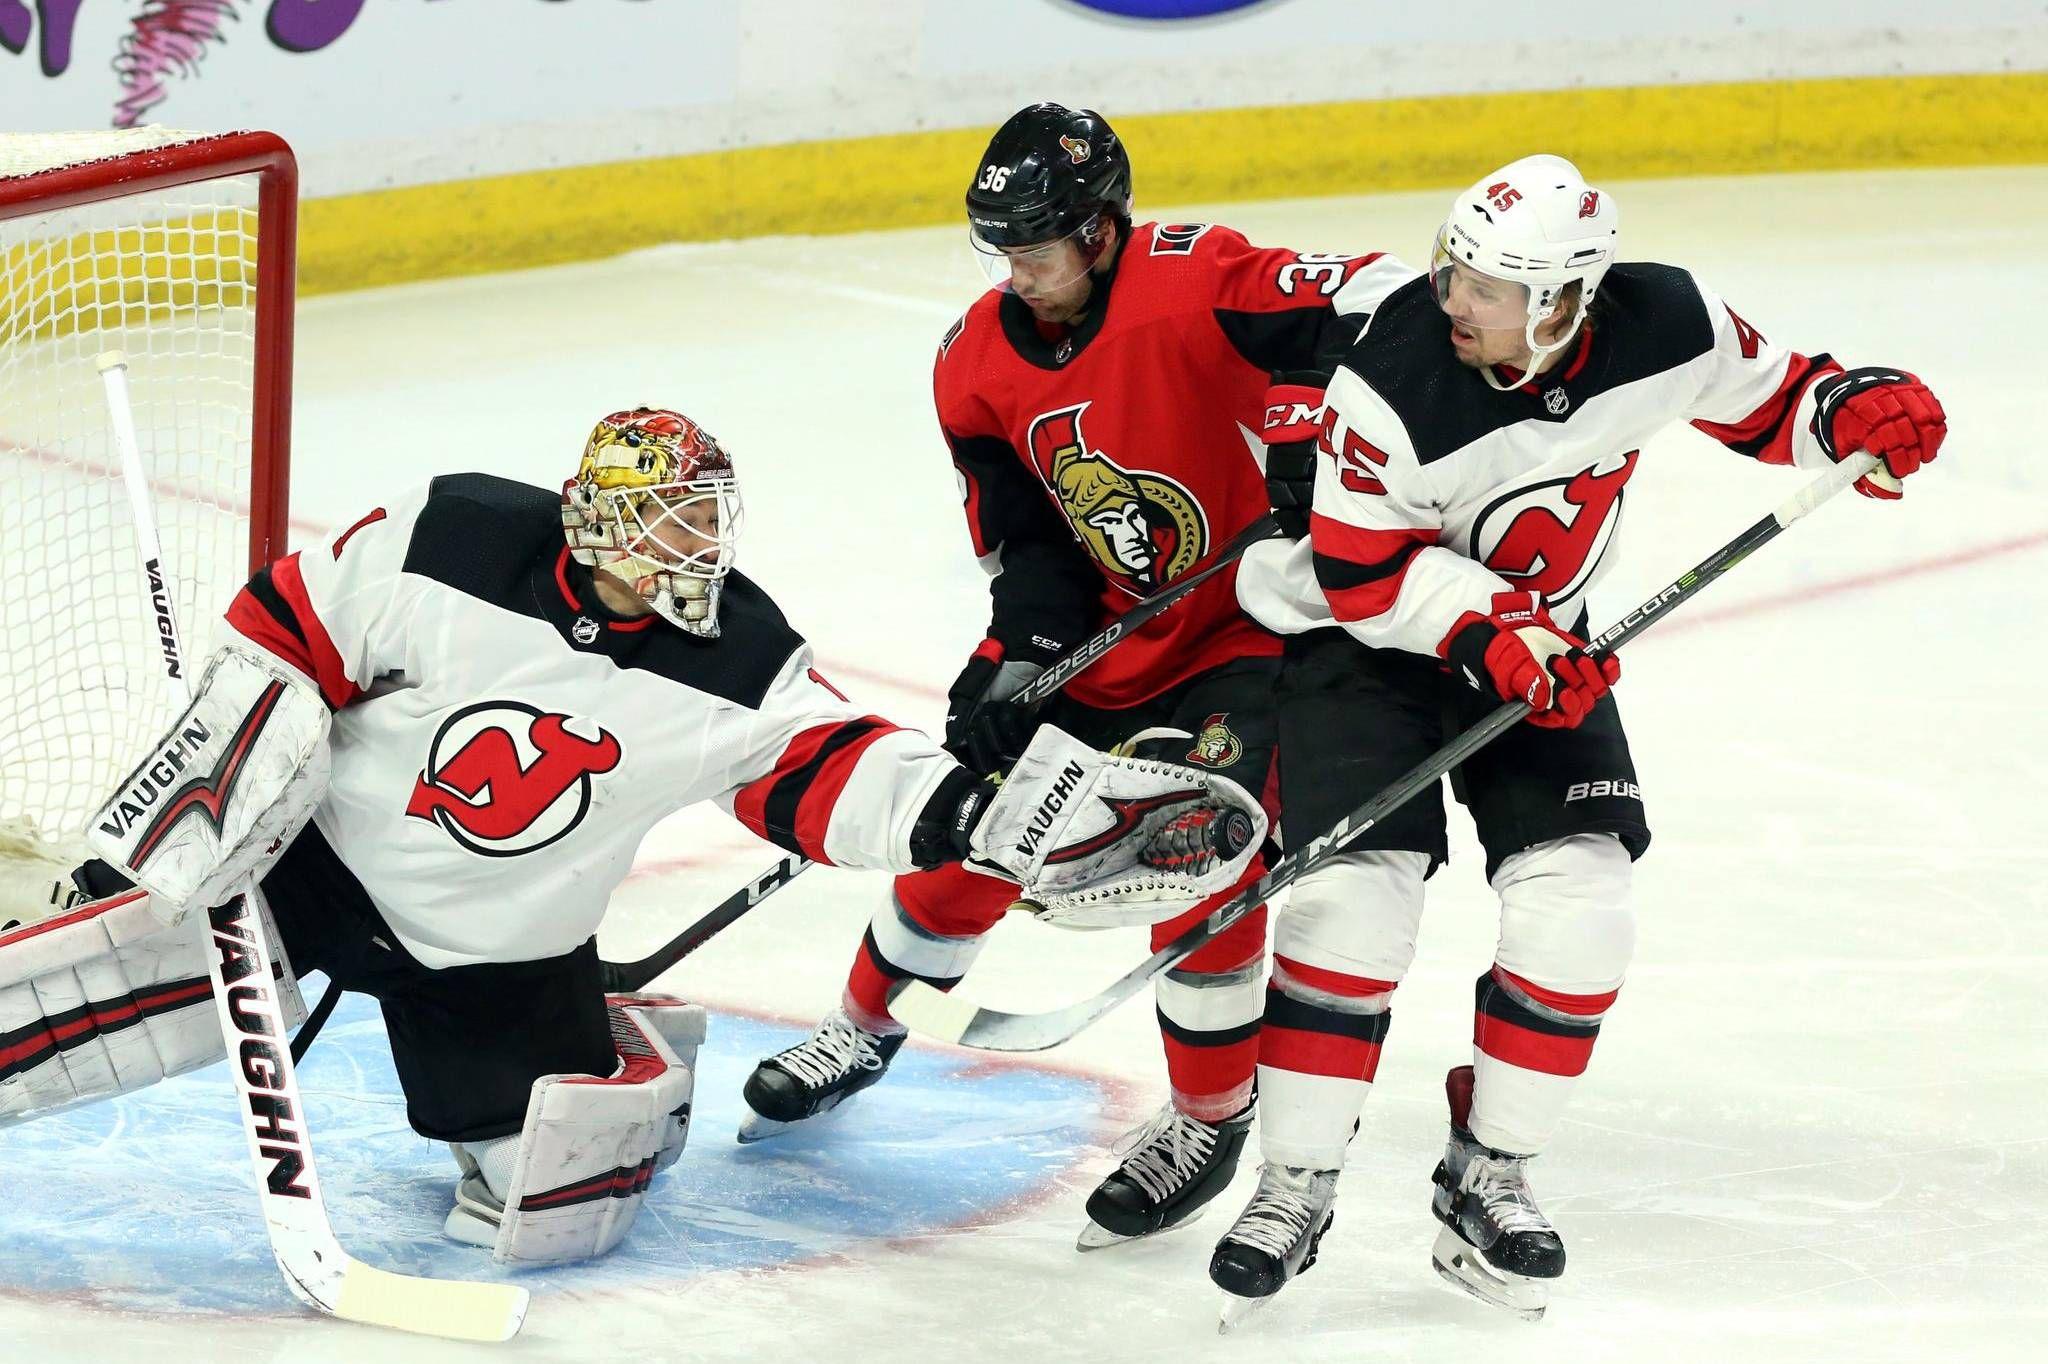 c12222e1f10 Duchene's three-point night leads under-manned Senators past Devils ...